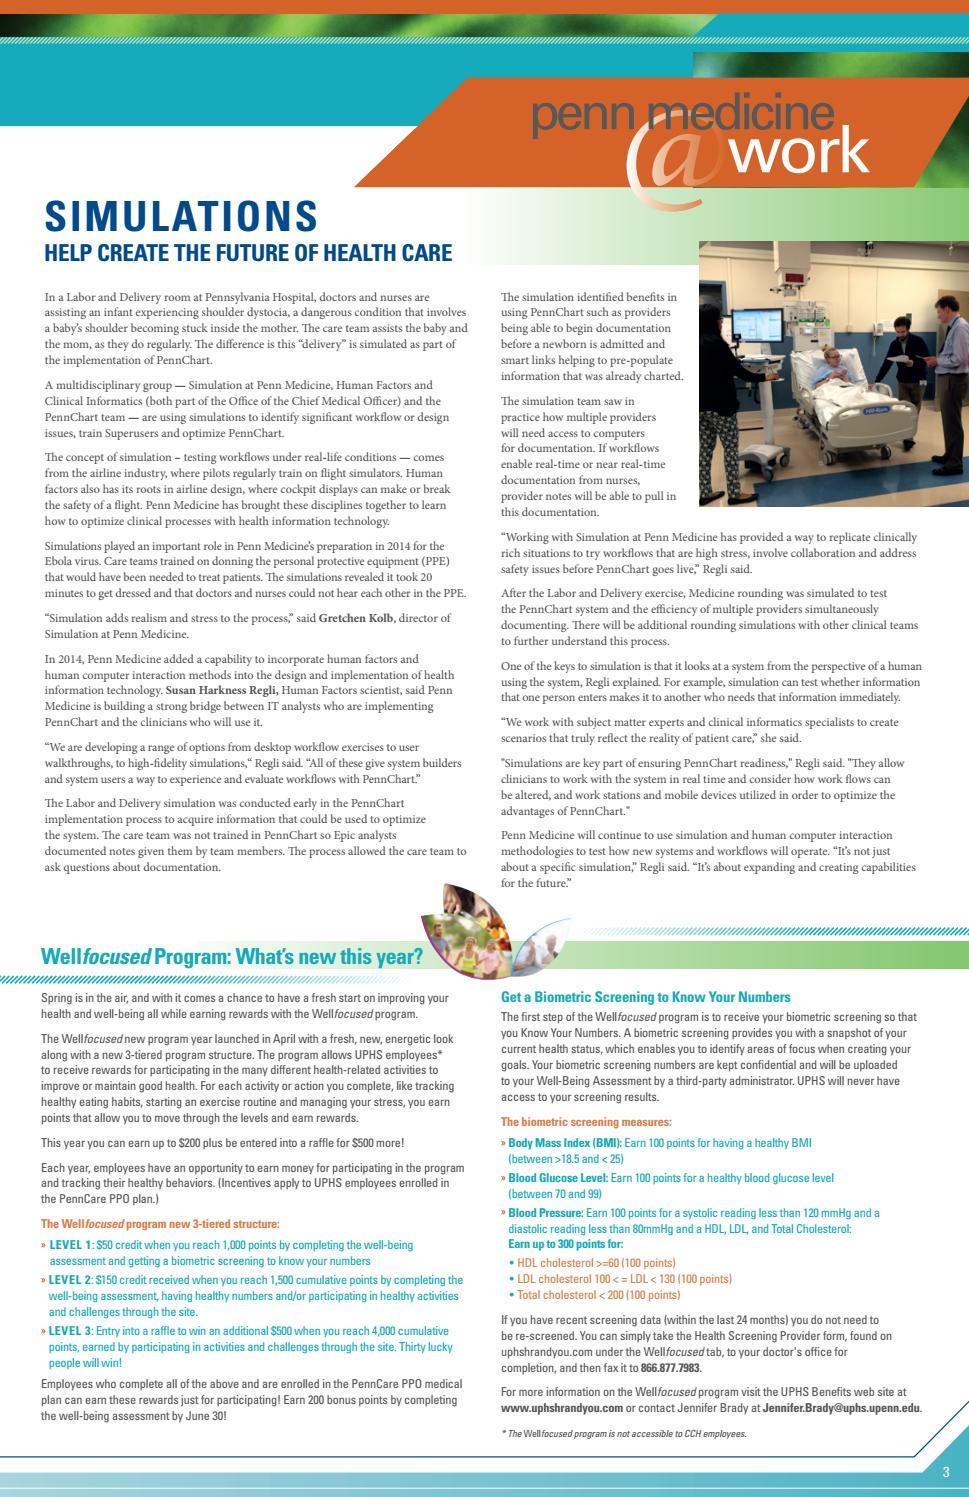 Digital Edition of System News - 6/10/2016 by Penn Medicine